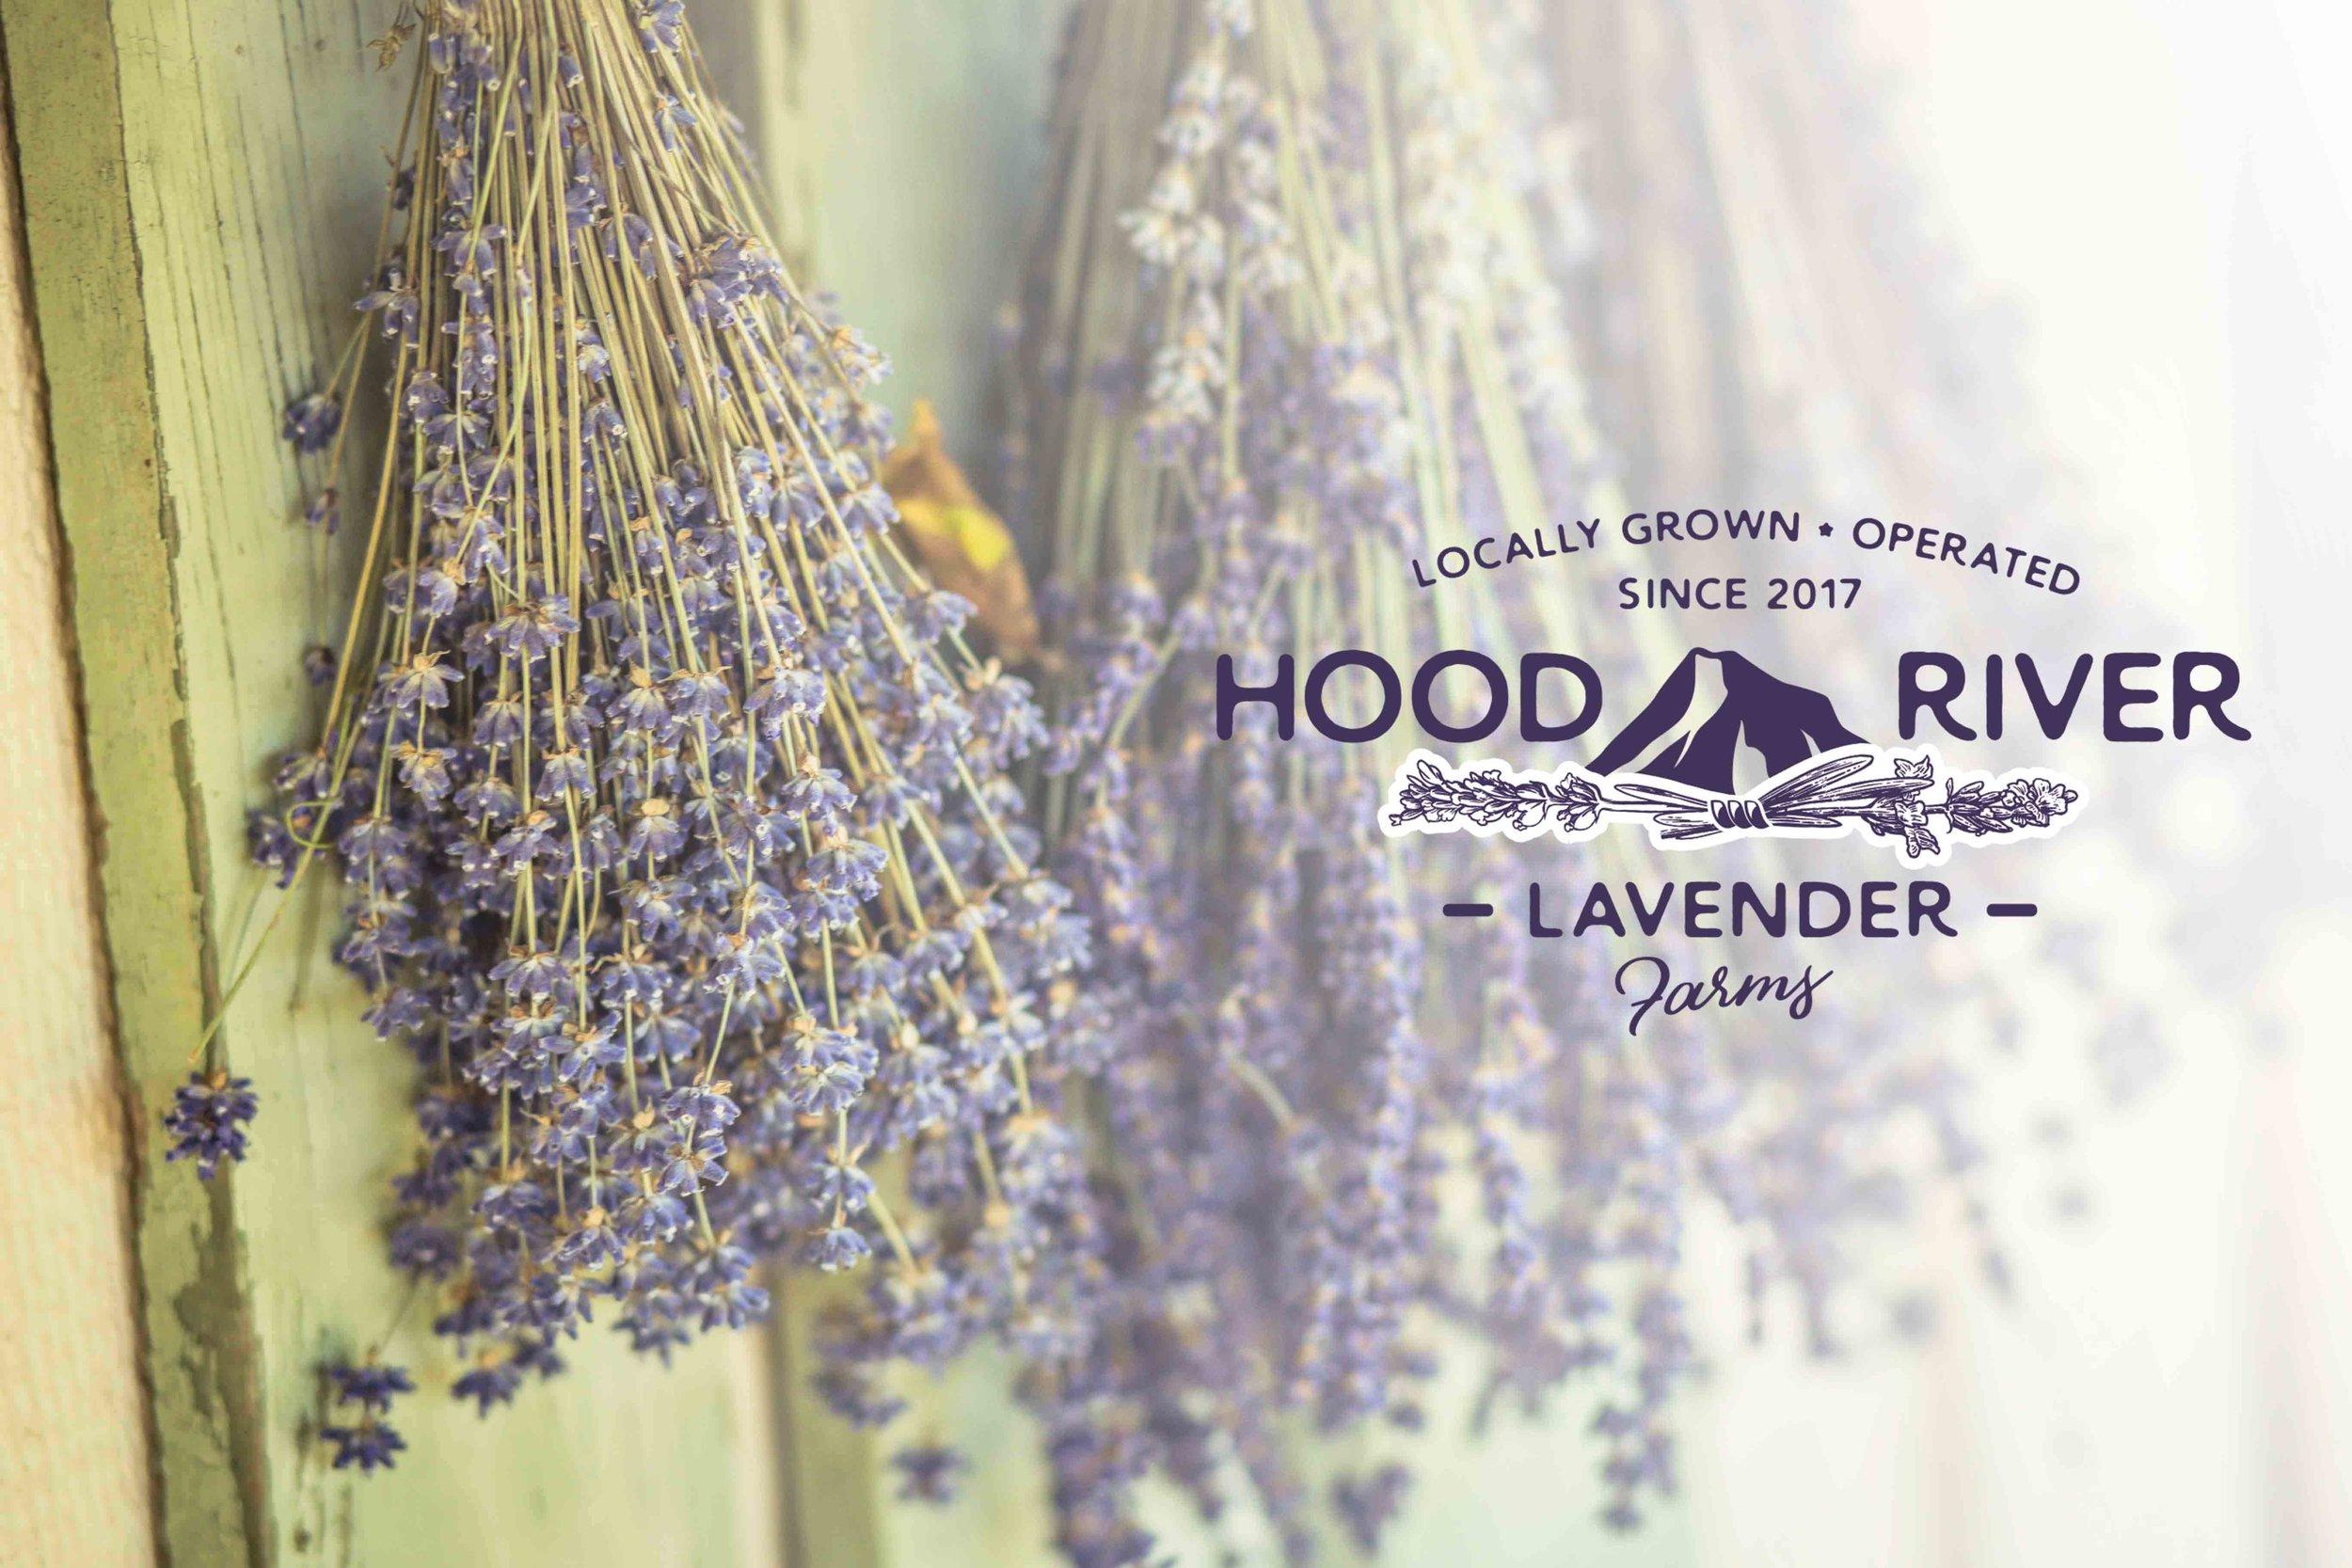 Hood River Lavender Farms Columbia Gorge buy lavender online hood river odell portland pacific northwest pnw creams lavender_-28 (1).jpg